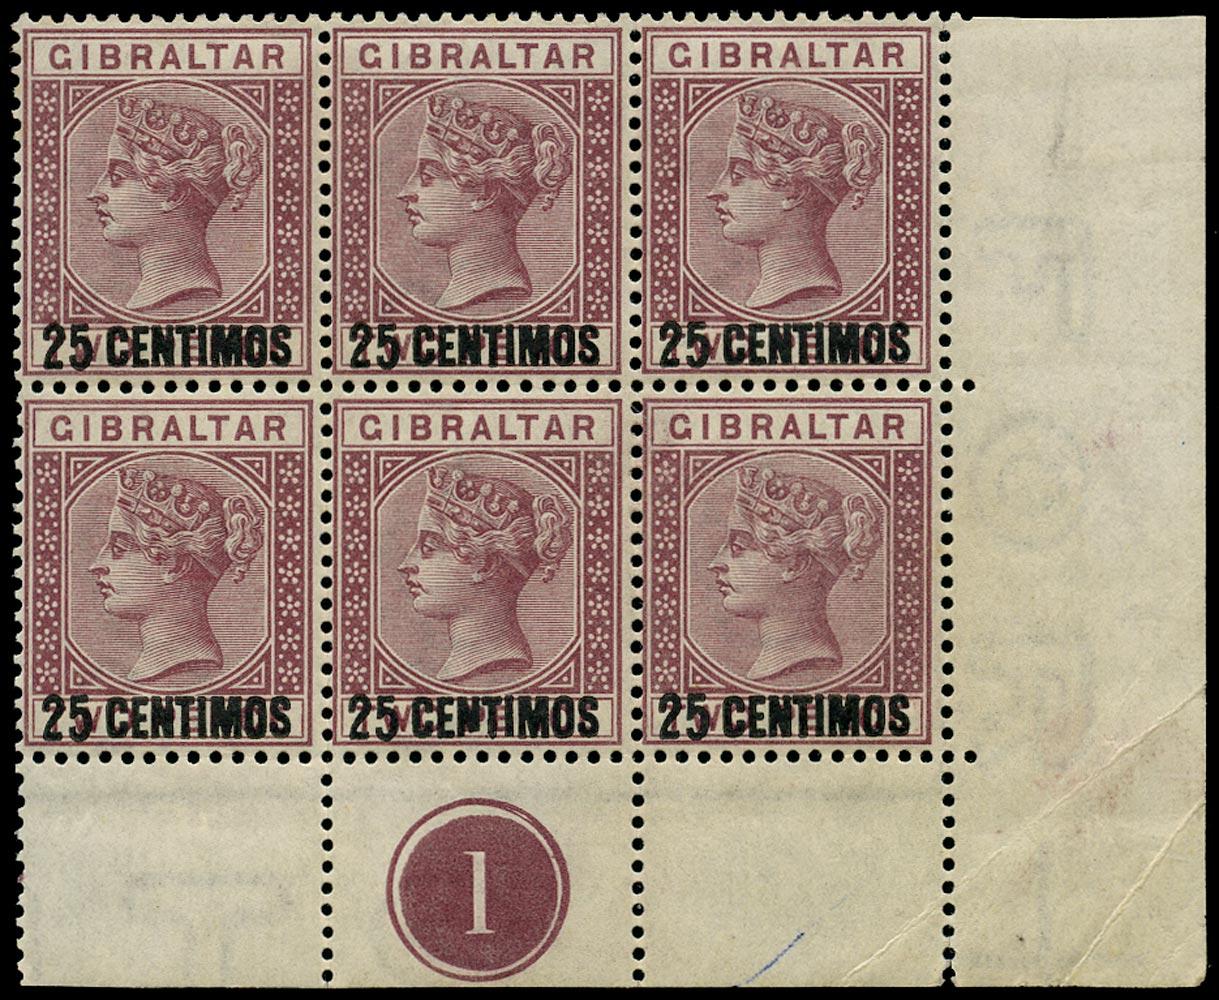 GIBRALTAR 1889  SG17/b Mint 25c on 2d brown-purple variety Broken N